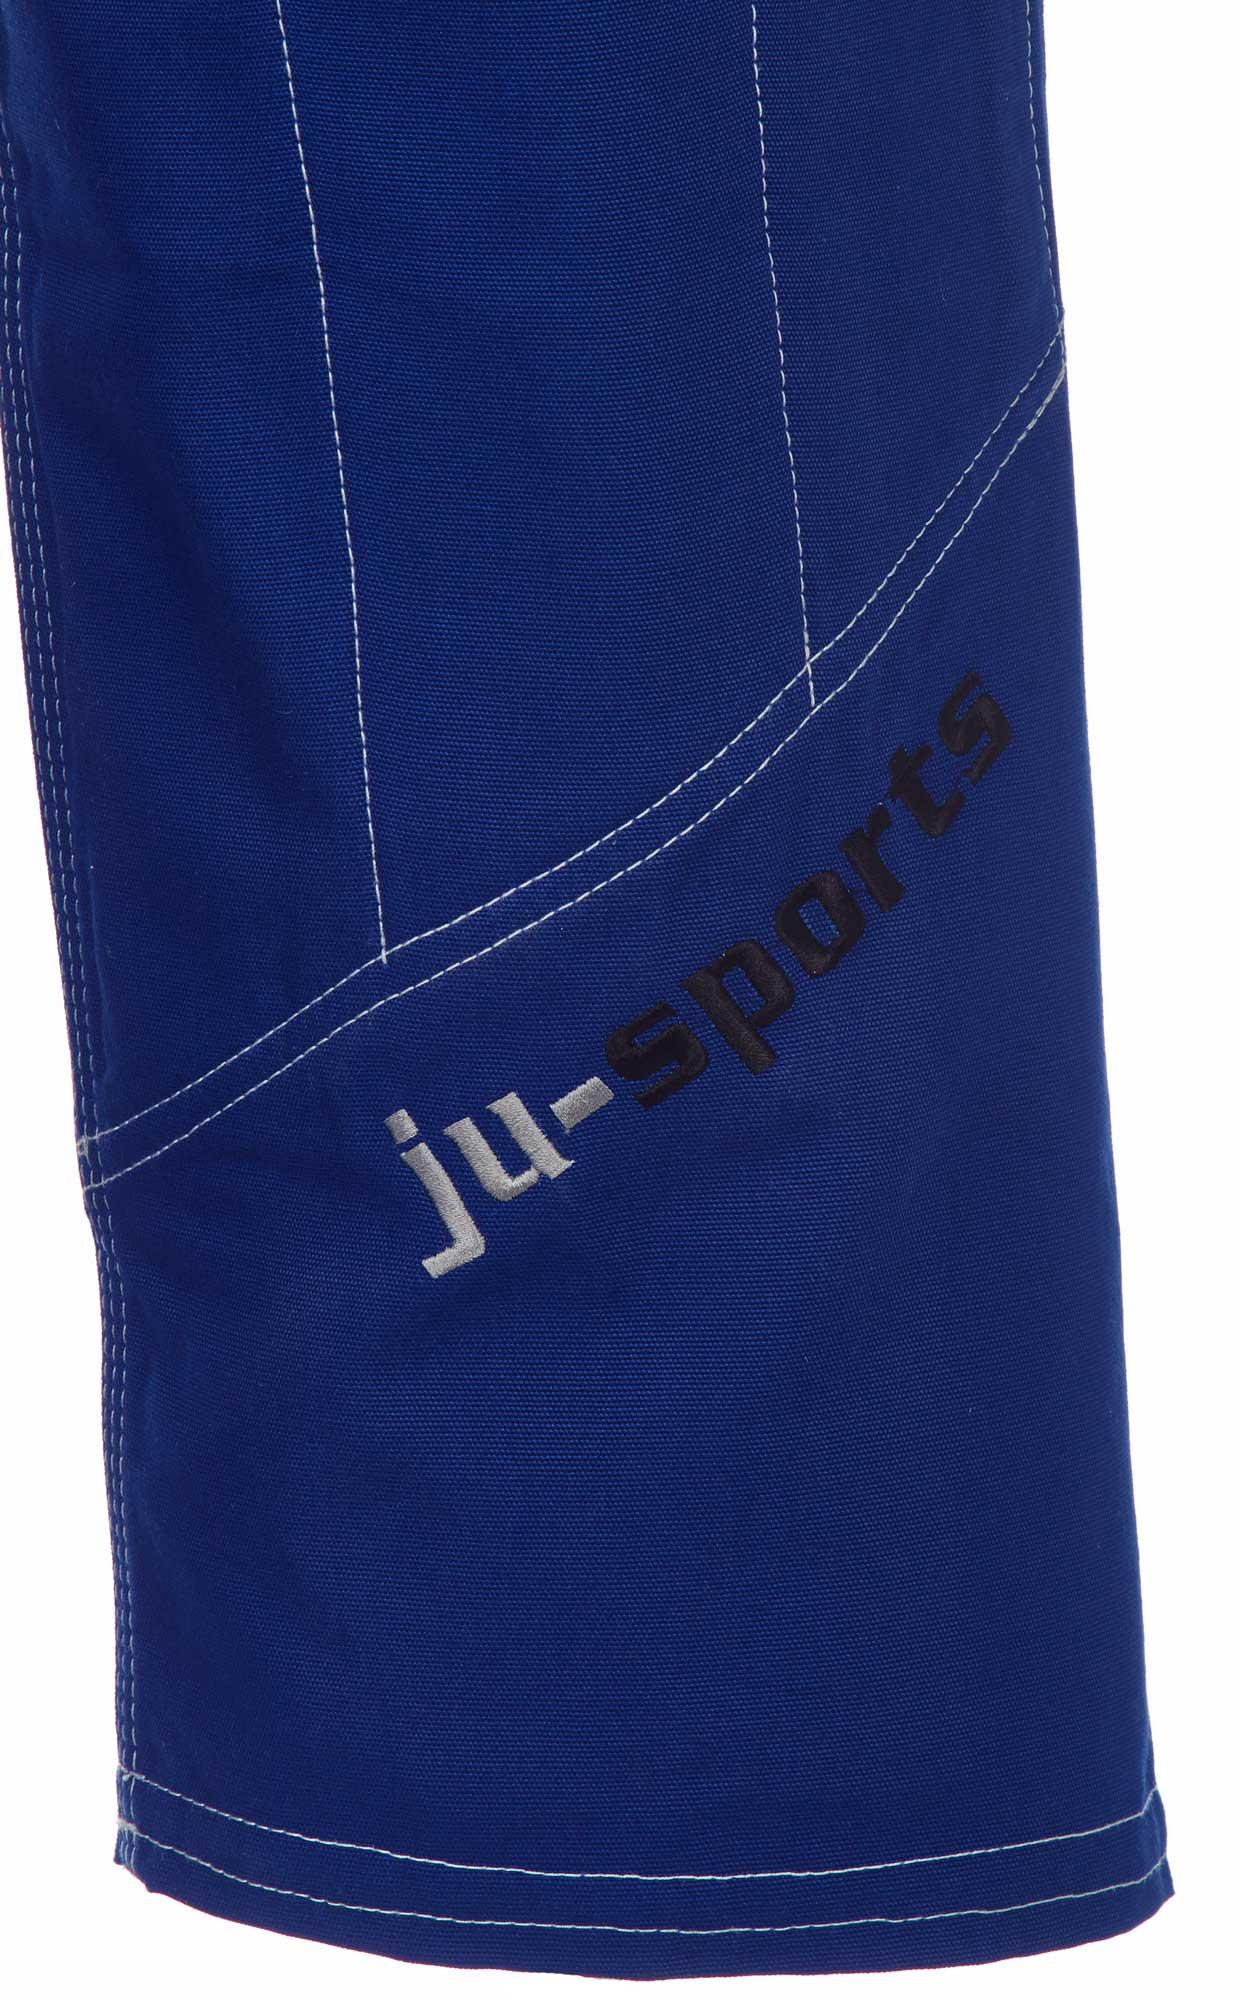 9244000-Supernova-Blue-Azul-Hose-BJJ-Gi-Ju-Jutsu-d6